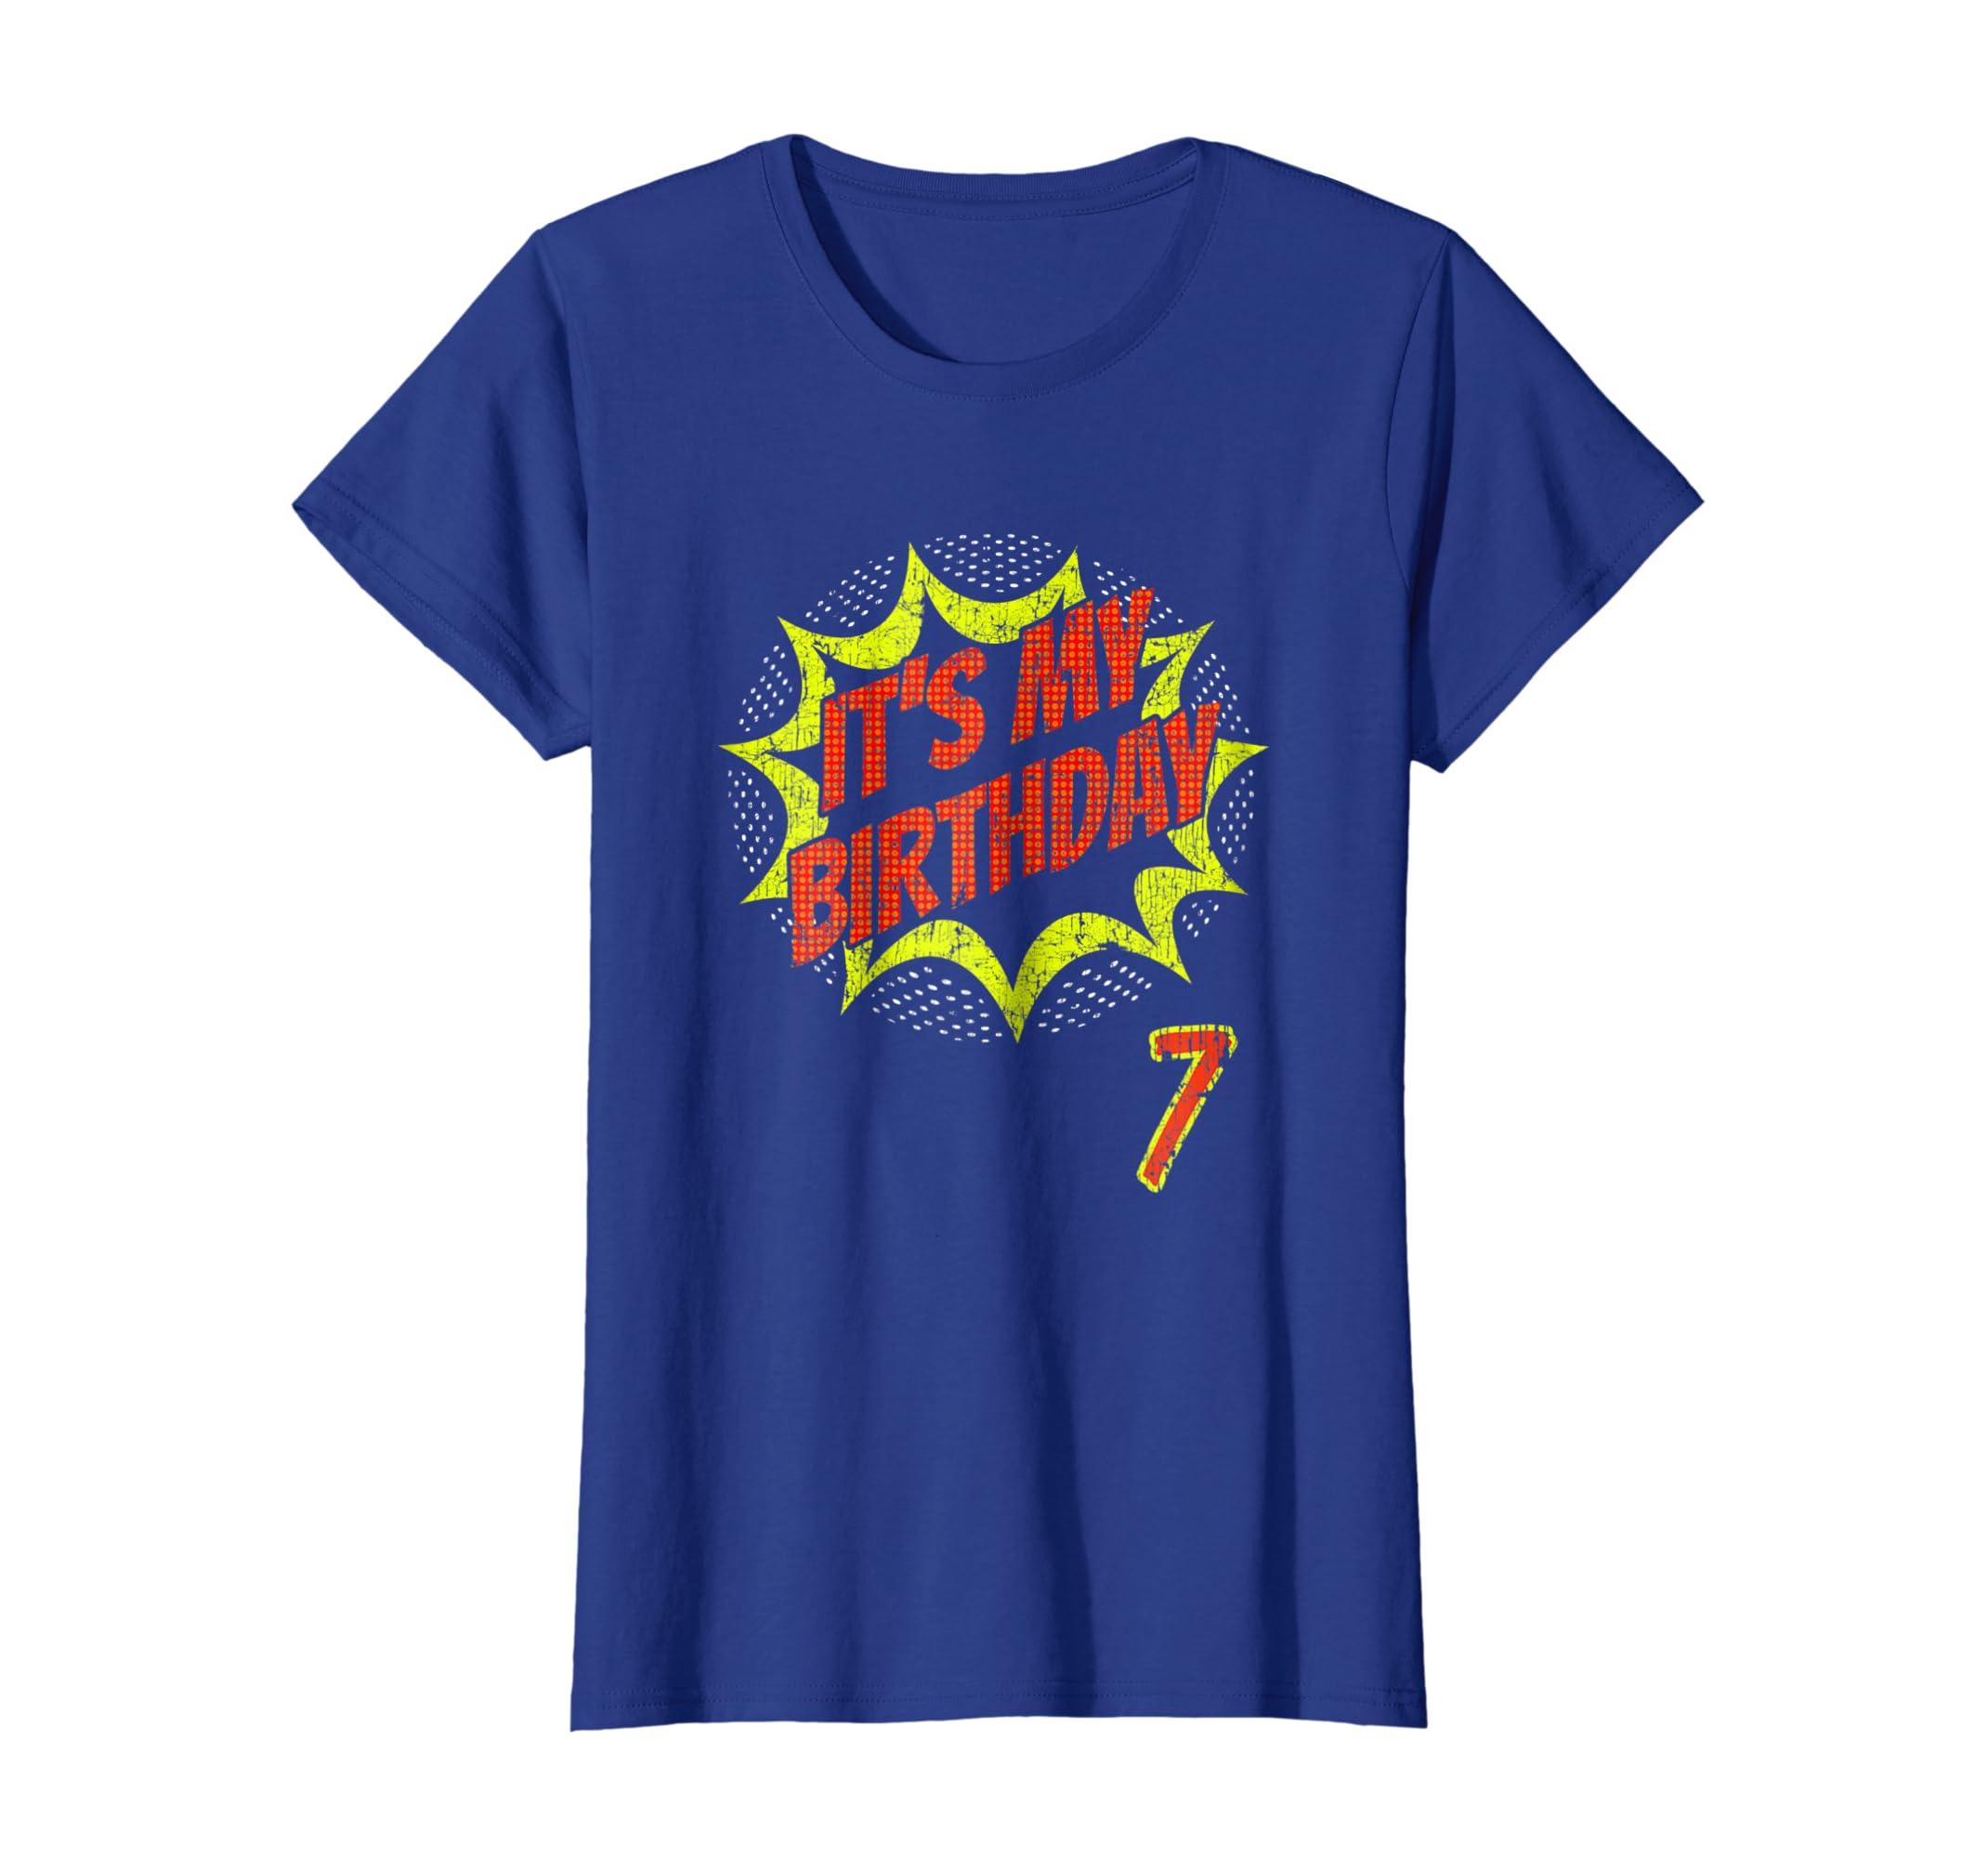 Amazon Superhero Birthday Shirt 7 Year Old 7th BDay Super Hero Gift Clothing